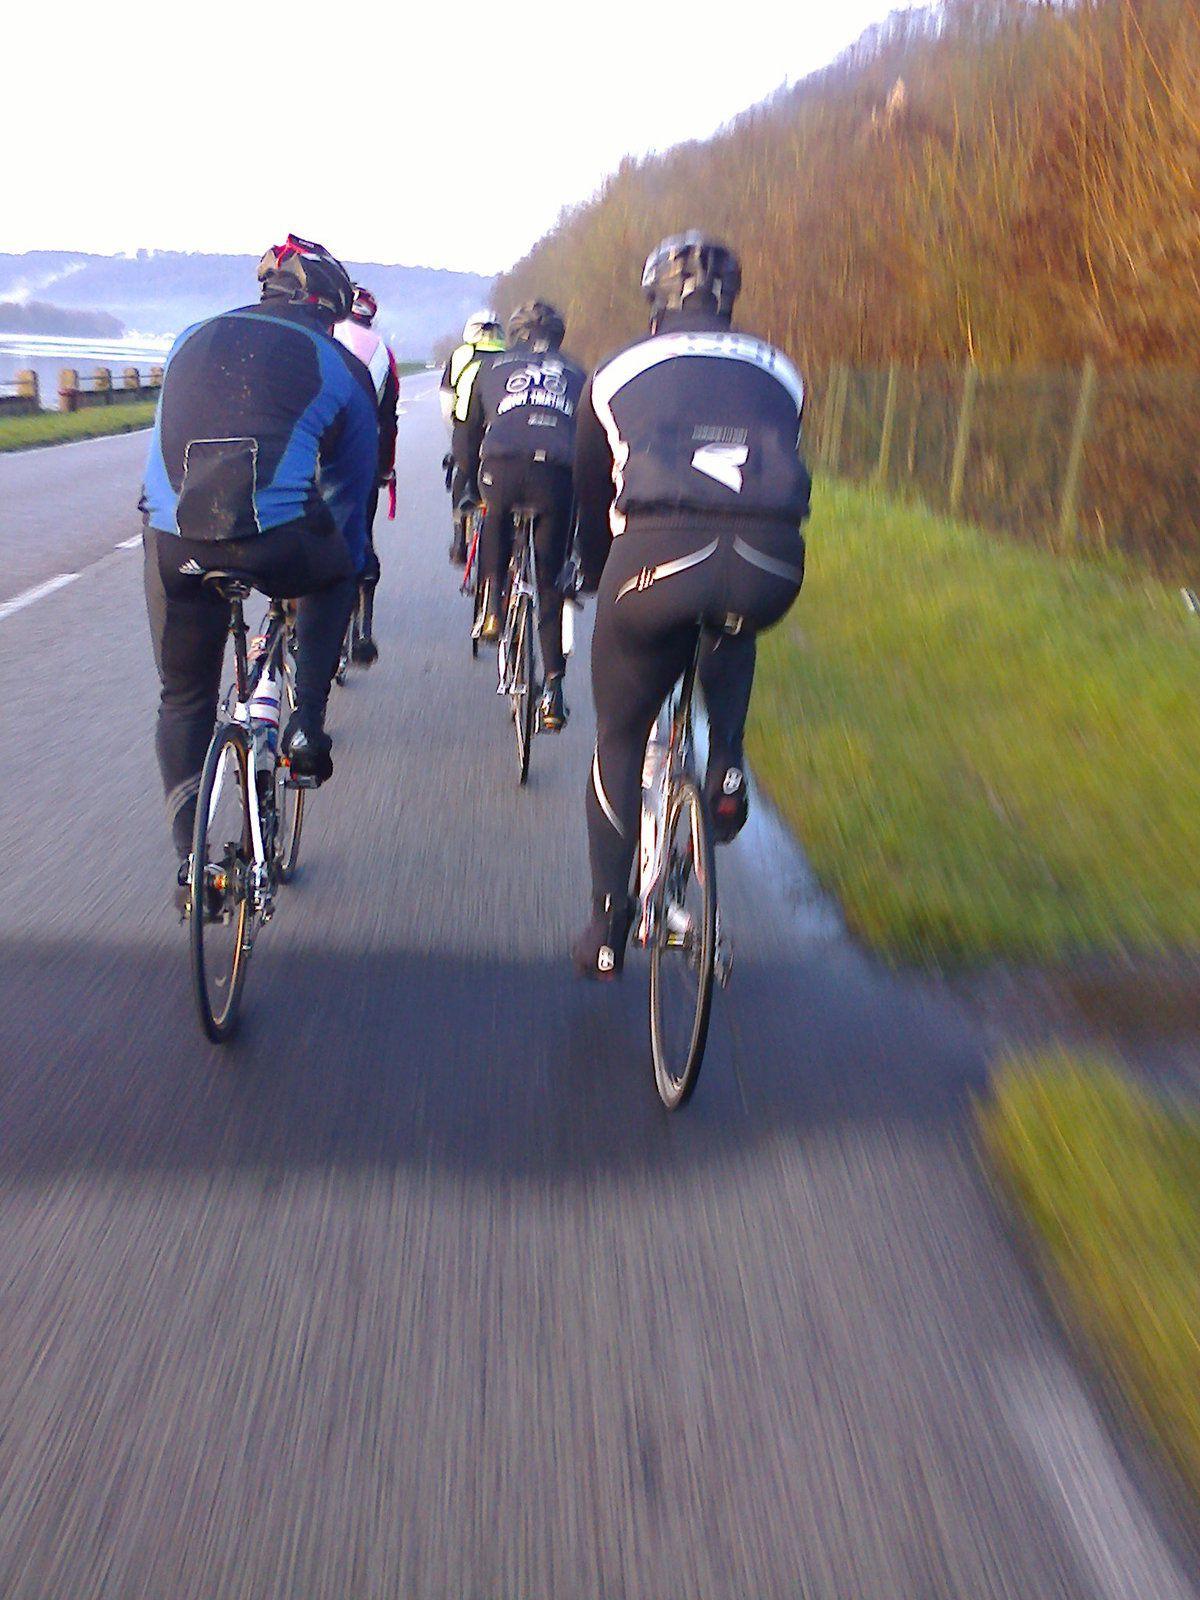 Sortie vélo dimanche matin